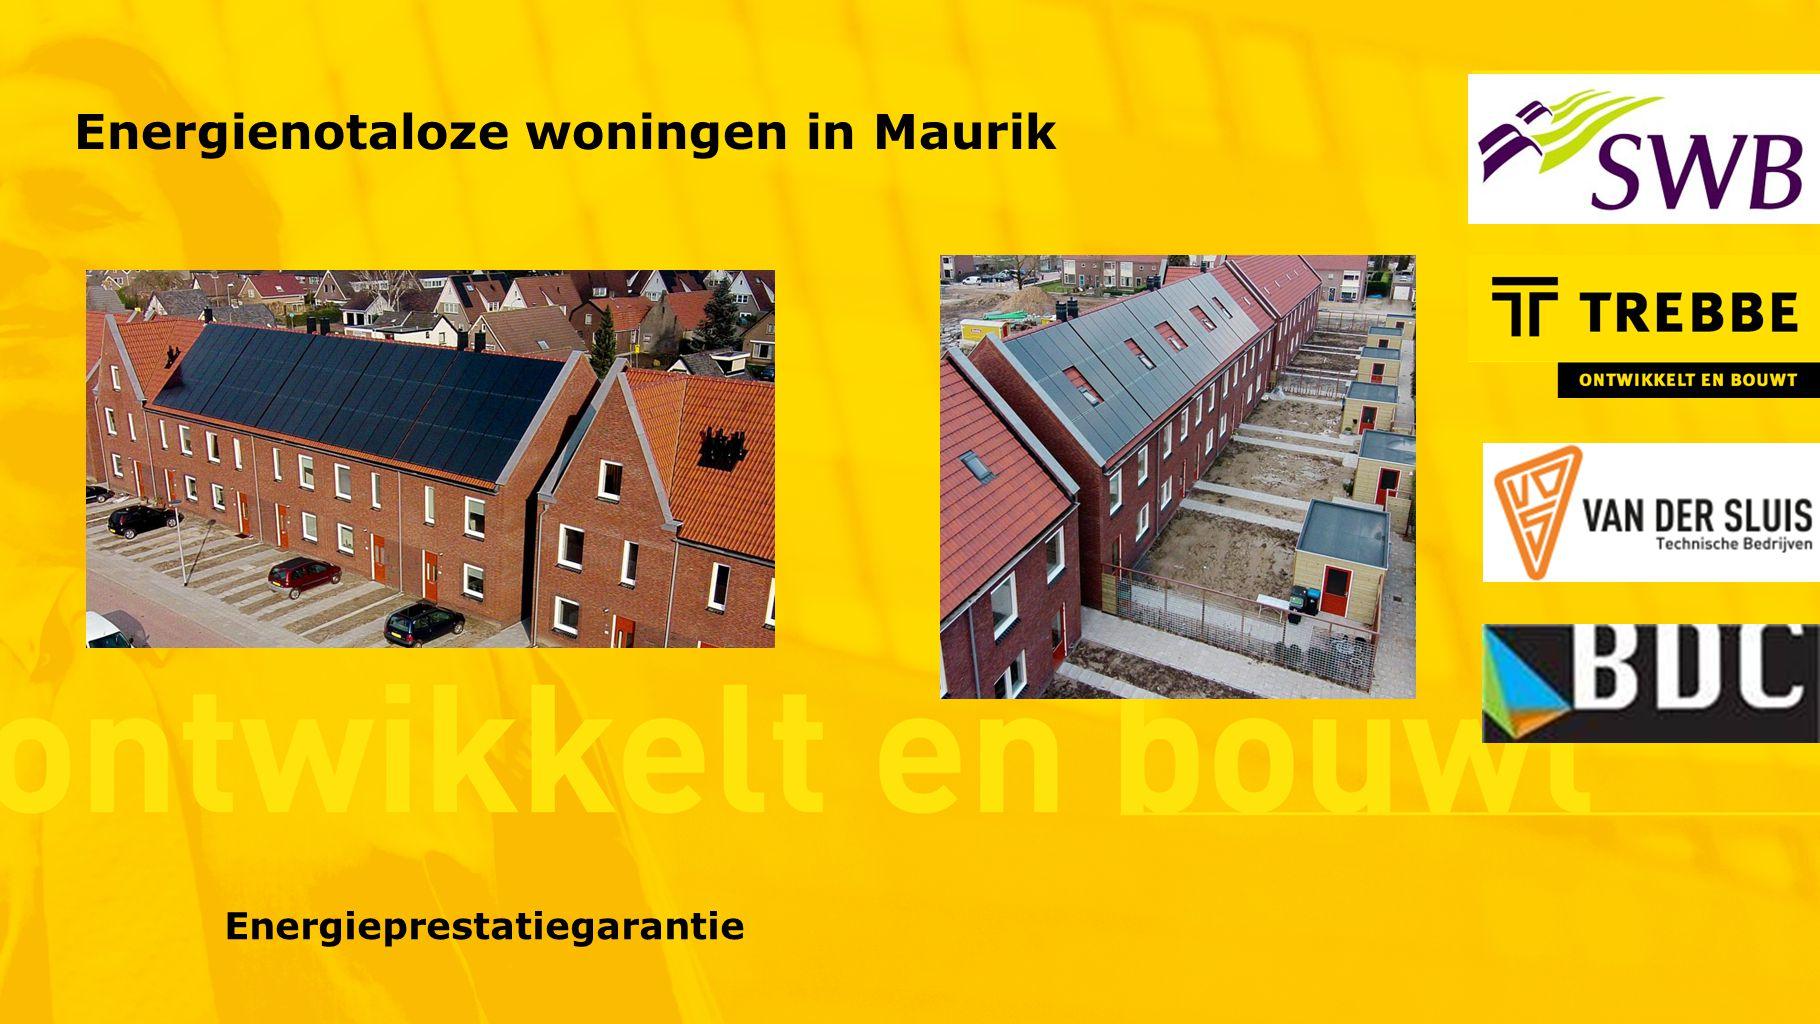 Energienotaloze woningen in Maurik